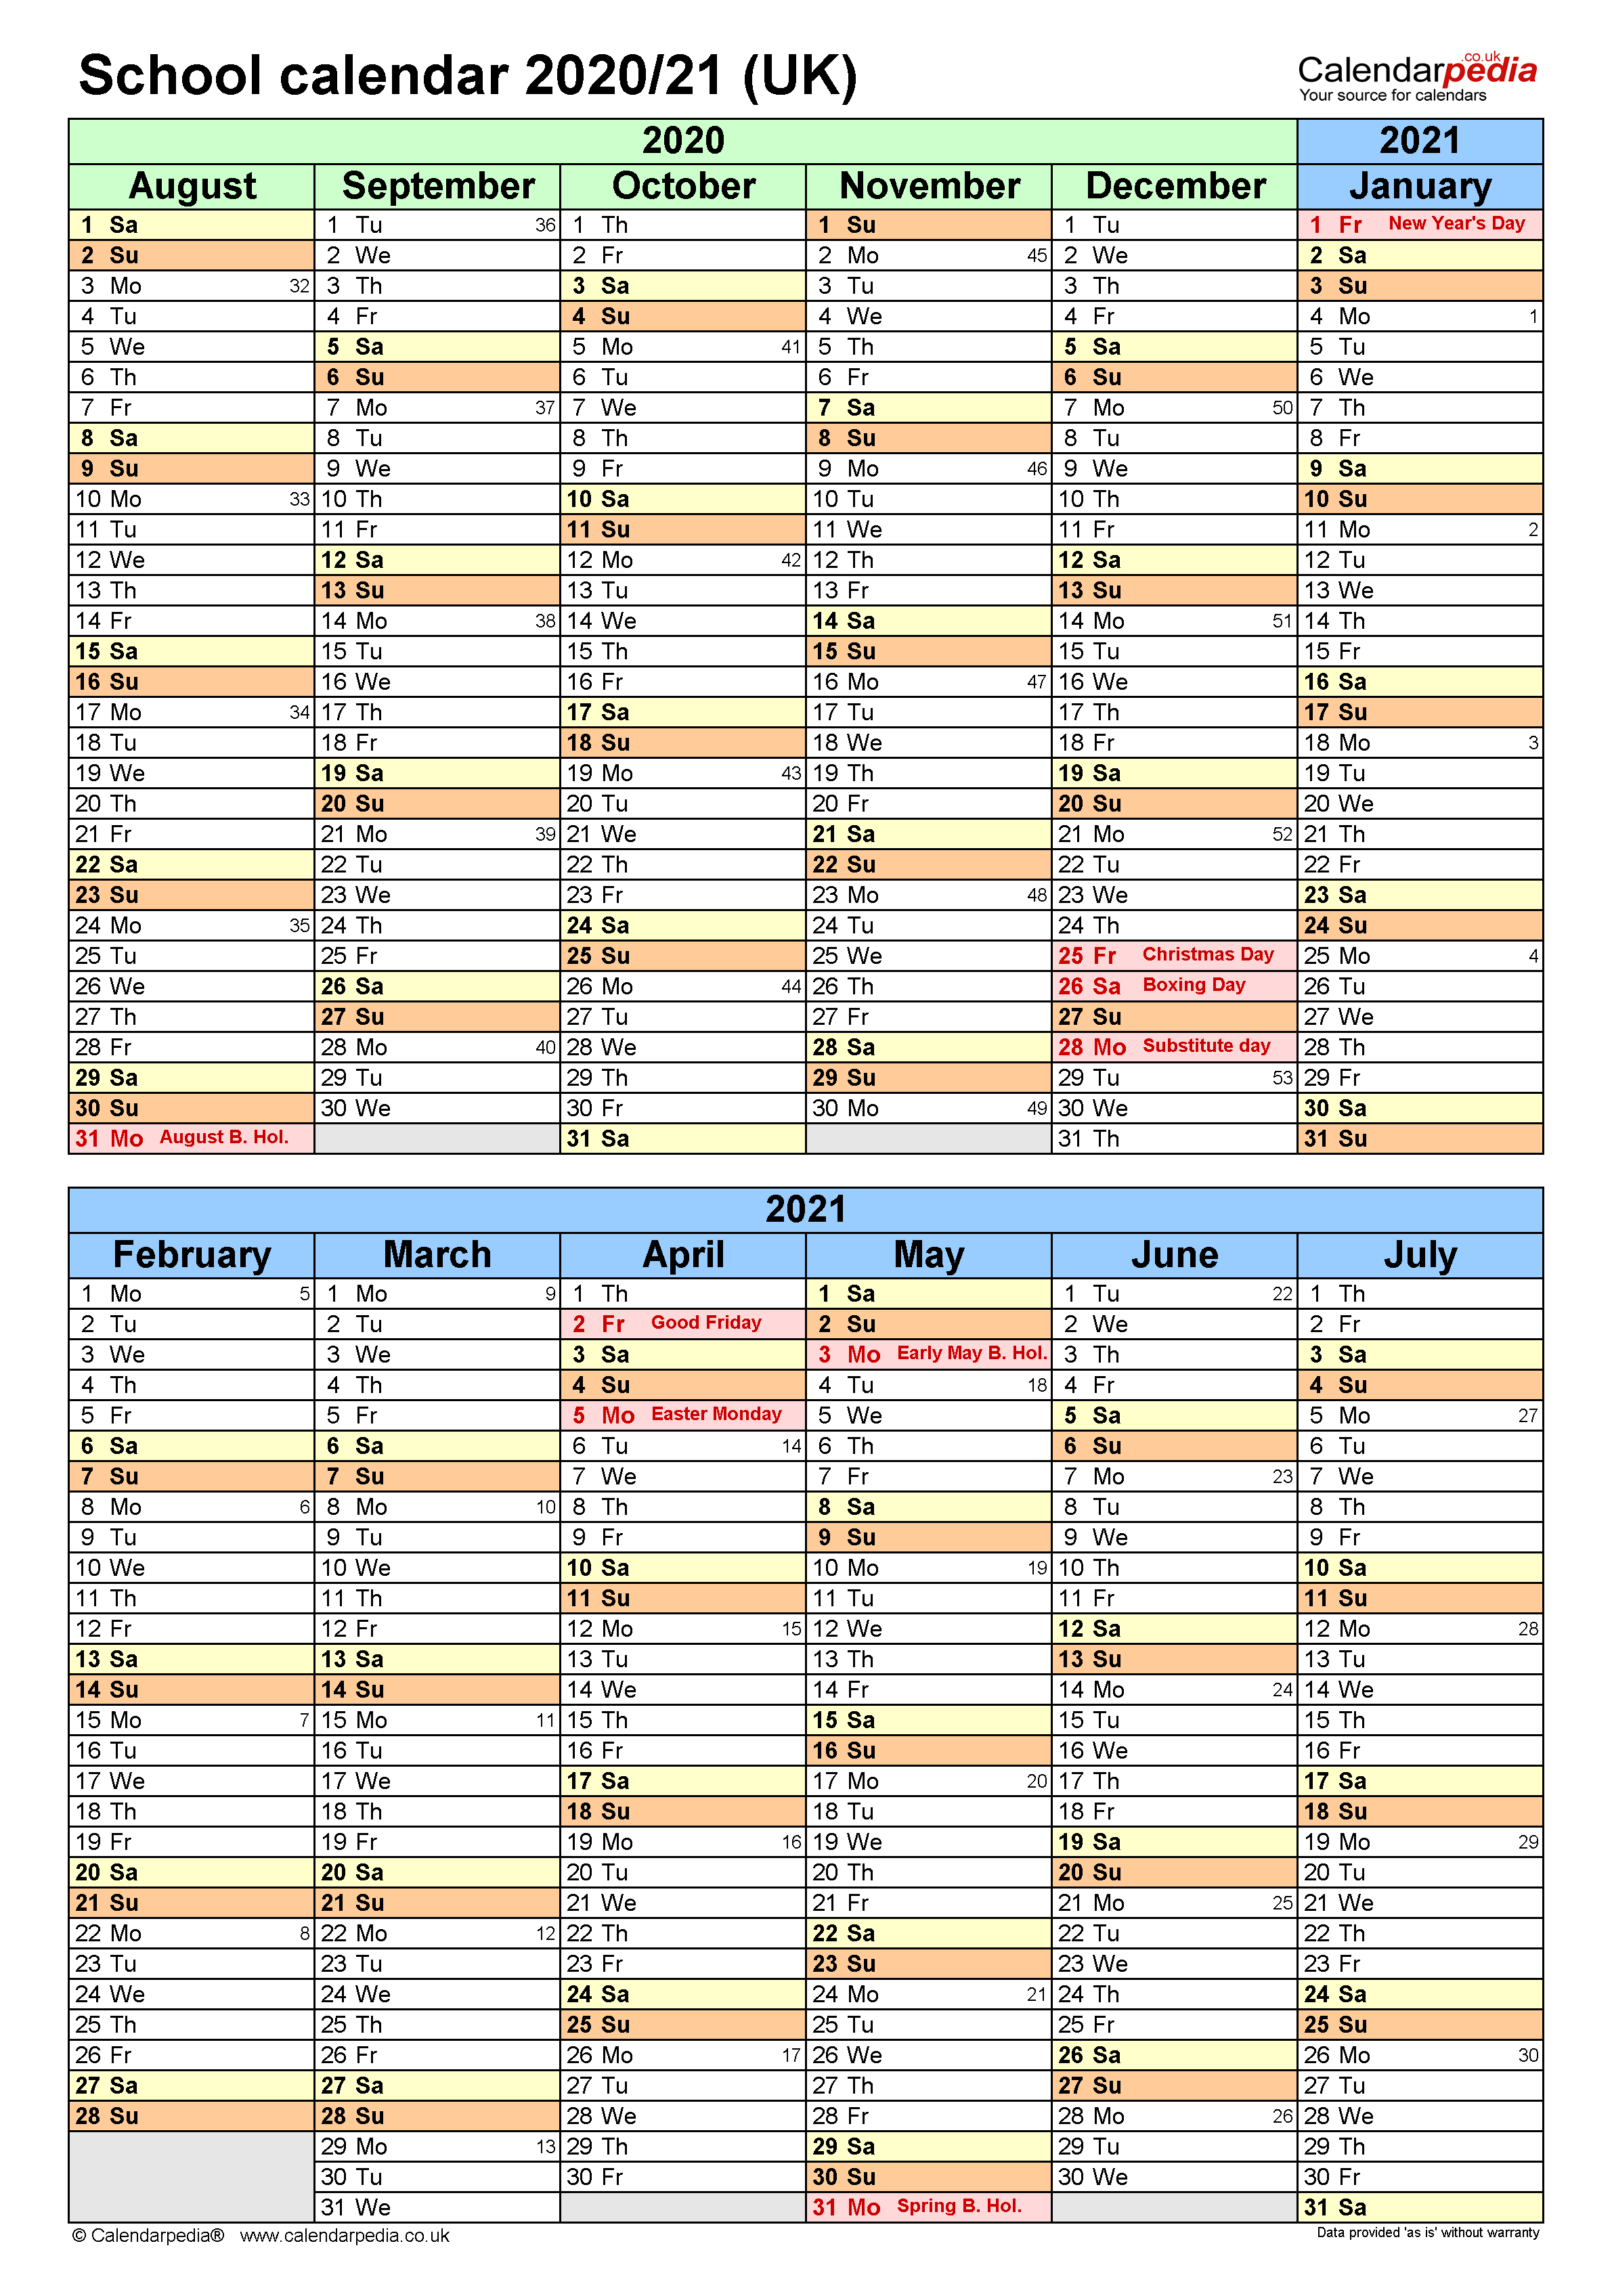 School Calendars 2020/2021 As Free Printable Word Templates With Regard To Colorado Springs District 20 2021 20 School Calendar